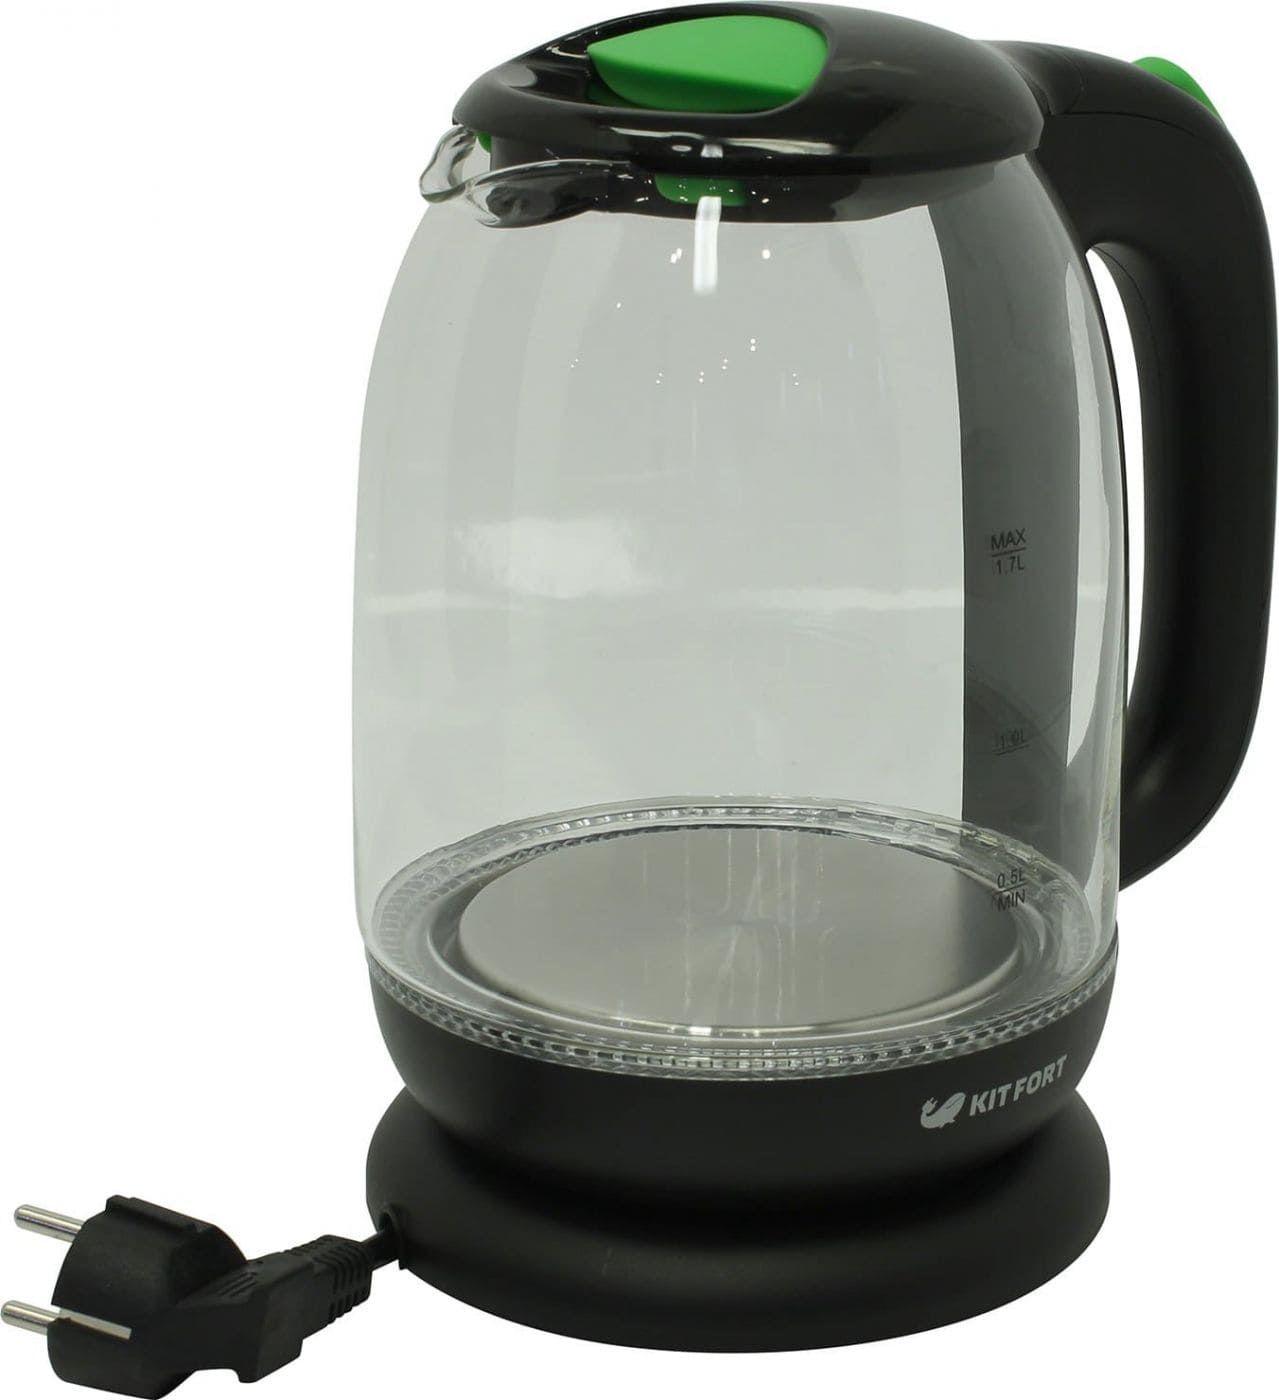 Чайник KitFort КТ-625-2 зеленый